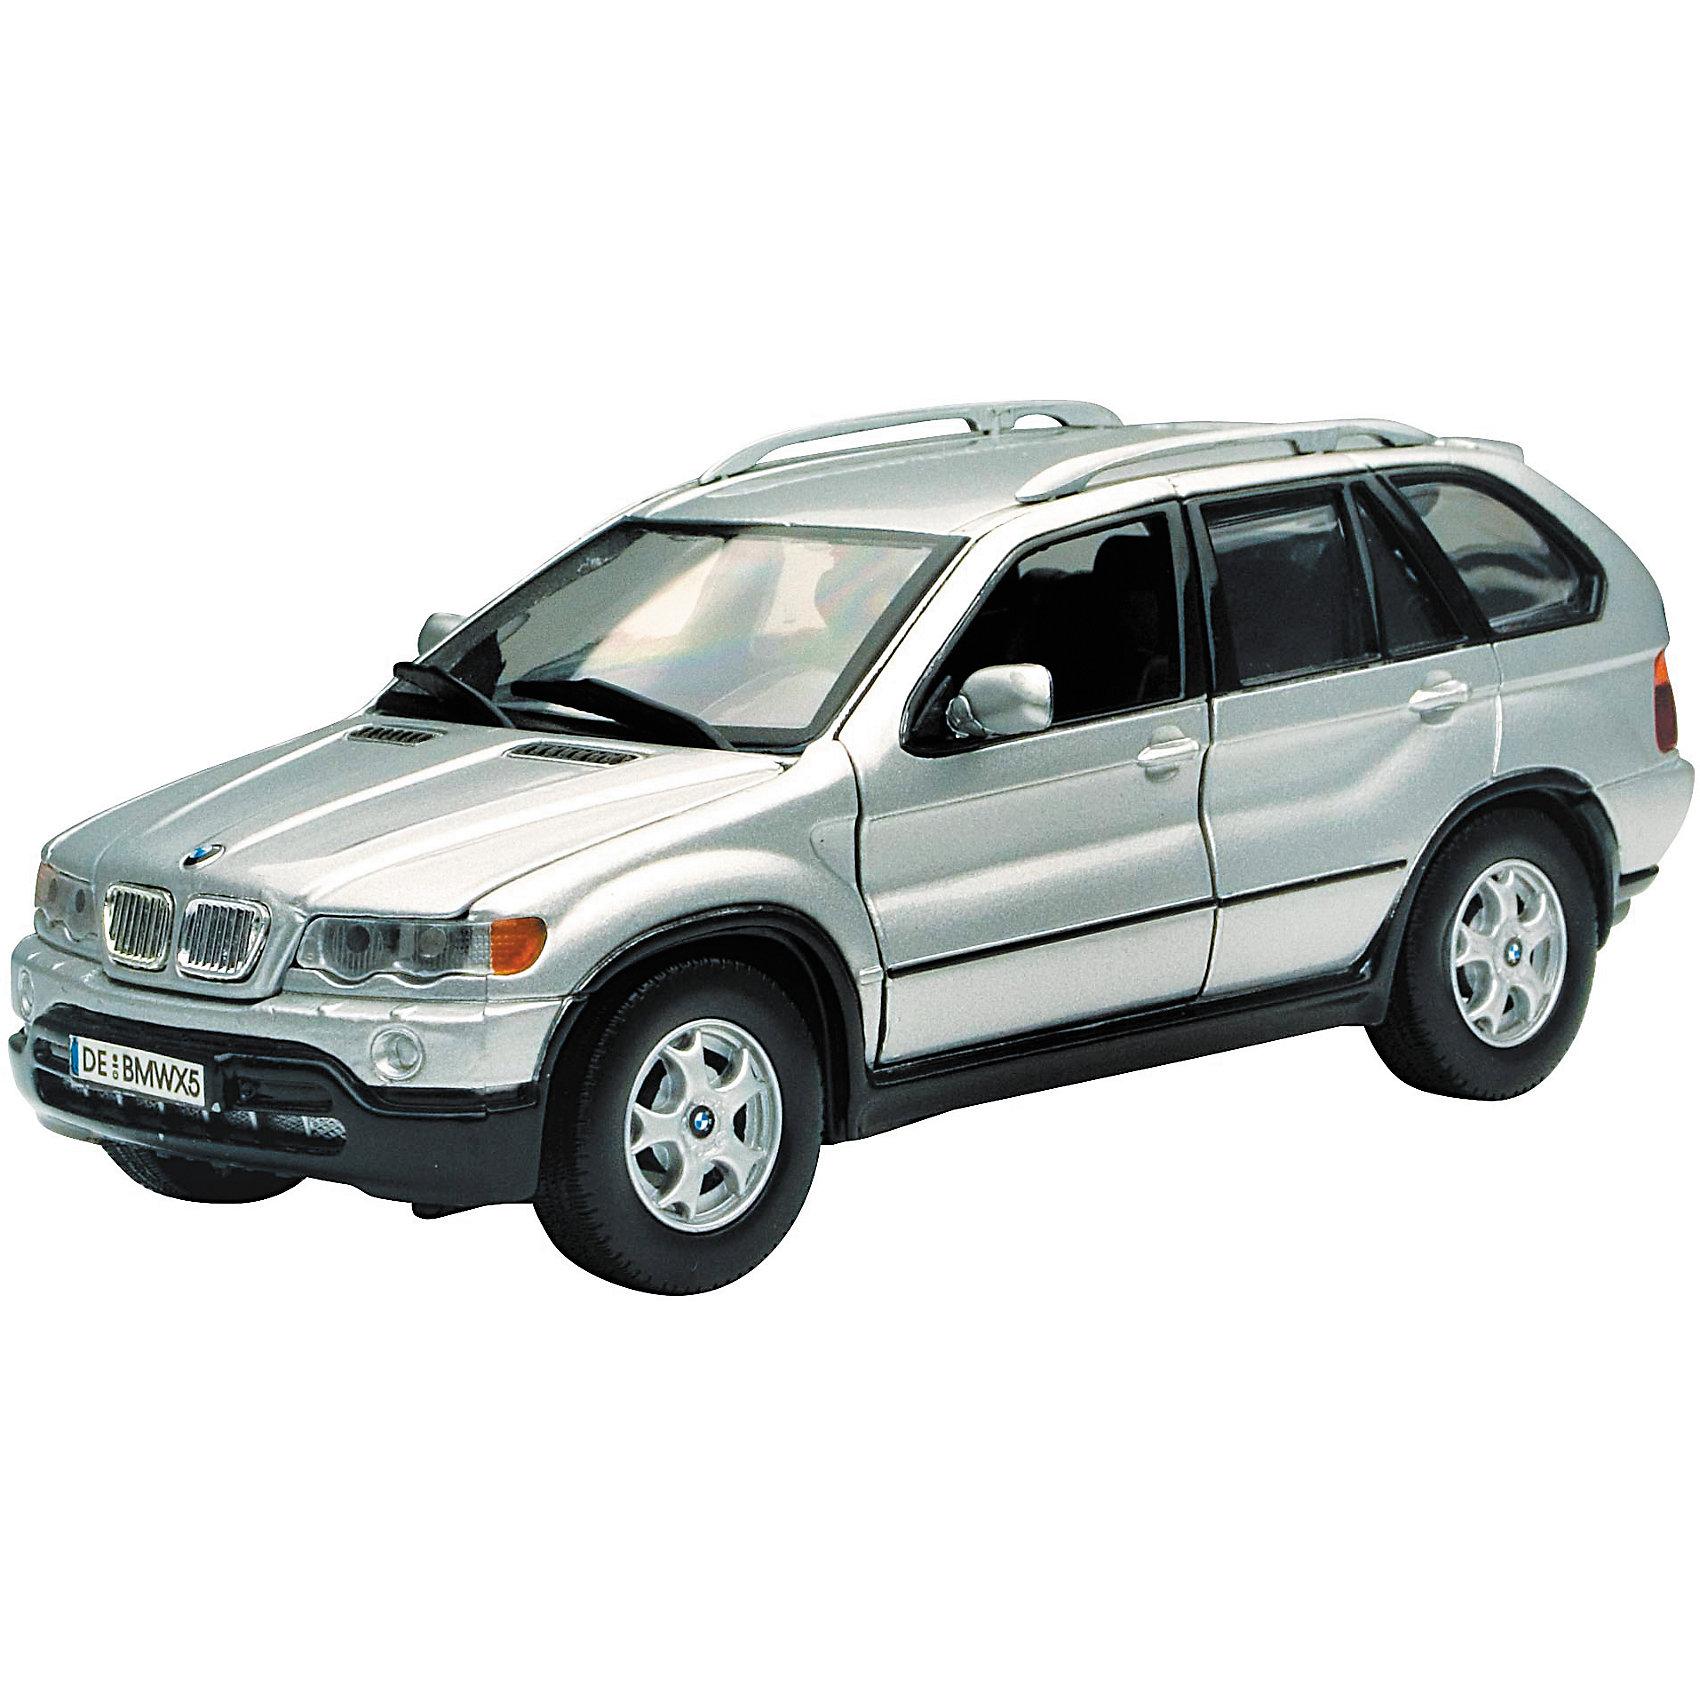 Машина BMW X5, 1:24, сераяМашинки<br><br><br>Ширина мм: 245<br>Глубина мм: 112<br>Высота мм: 102<br>Вес г: 692<br>Возраст от месяцев: 36<br>Возраст до месяцев: 84<br>Пол: Мужской<br>Возраст: Детский<br>SKU: 6722022